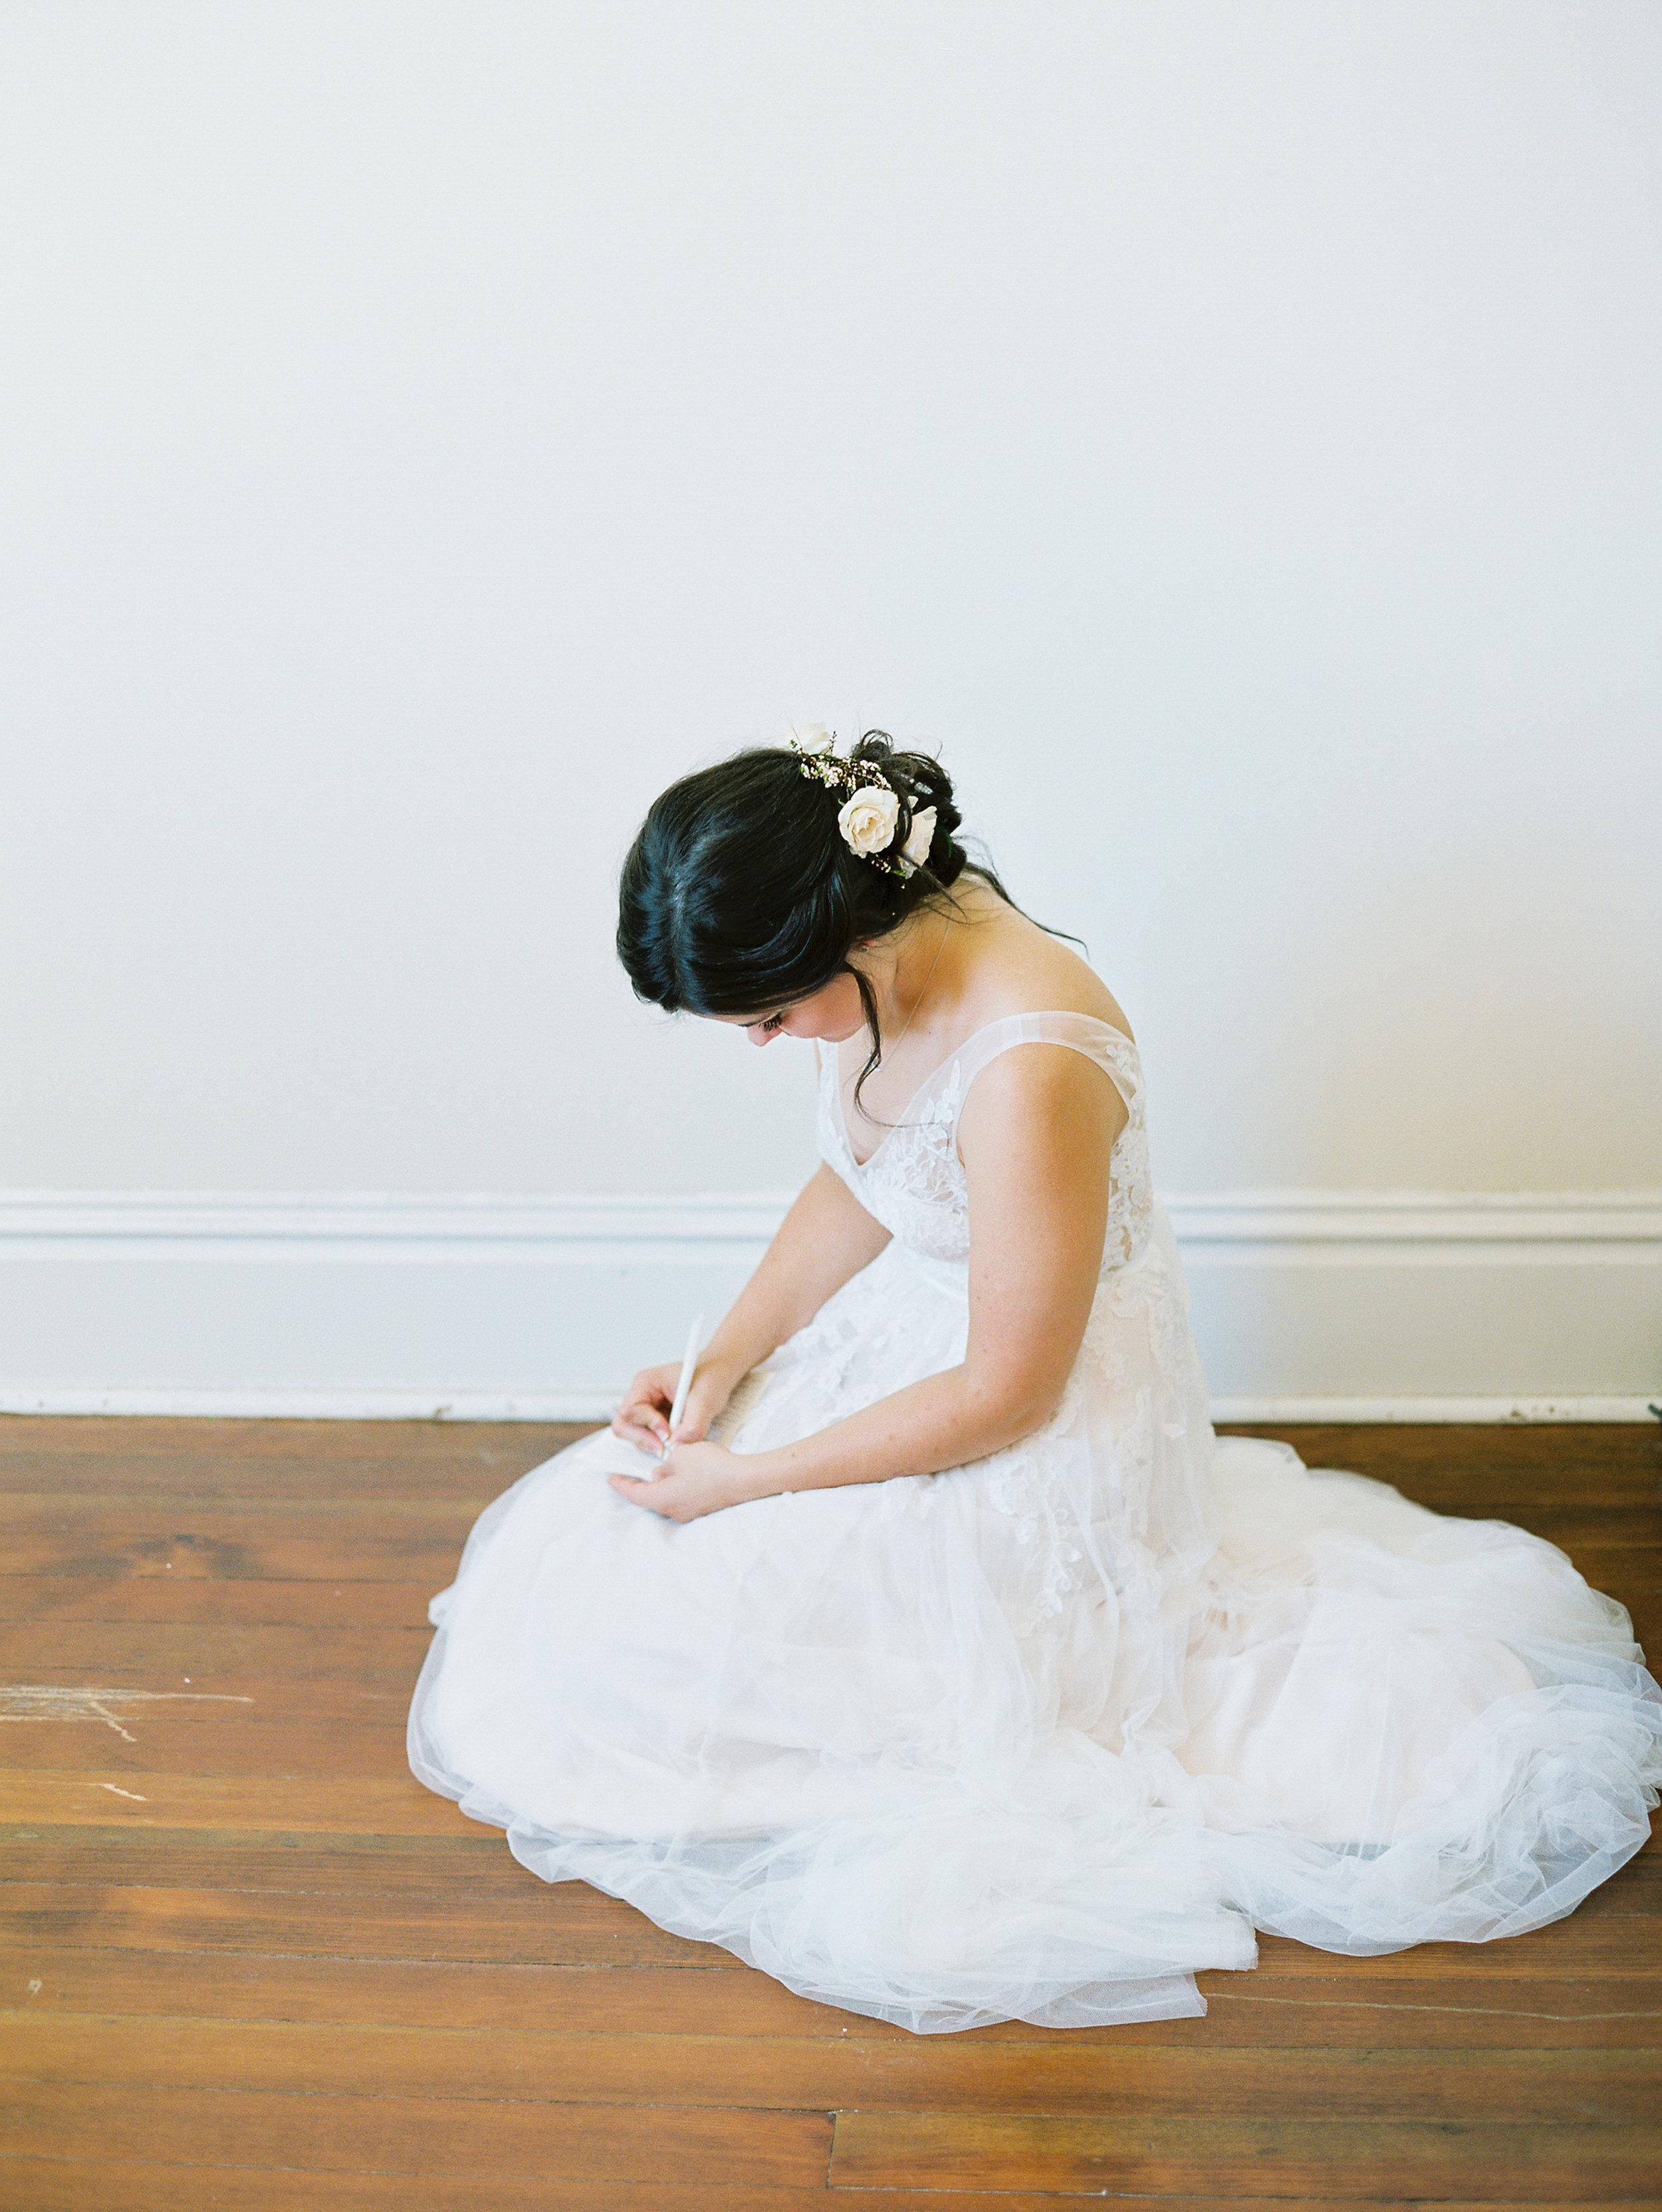 Idaho-Field-Forest-Wedding-Film-Photographer-Kristina-Adams-68.jpg